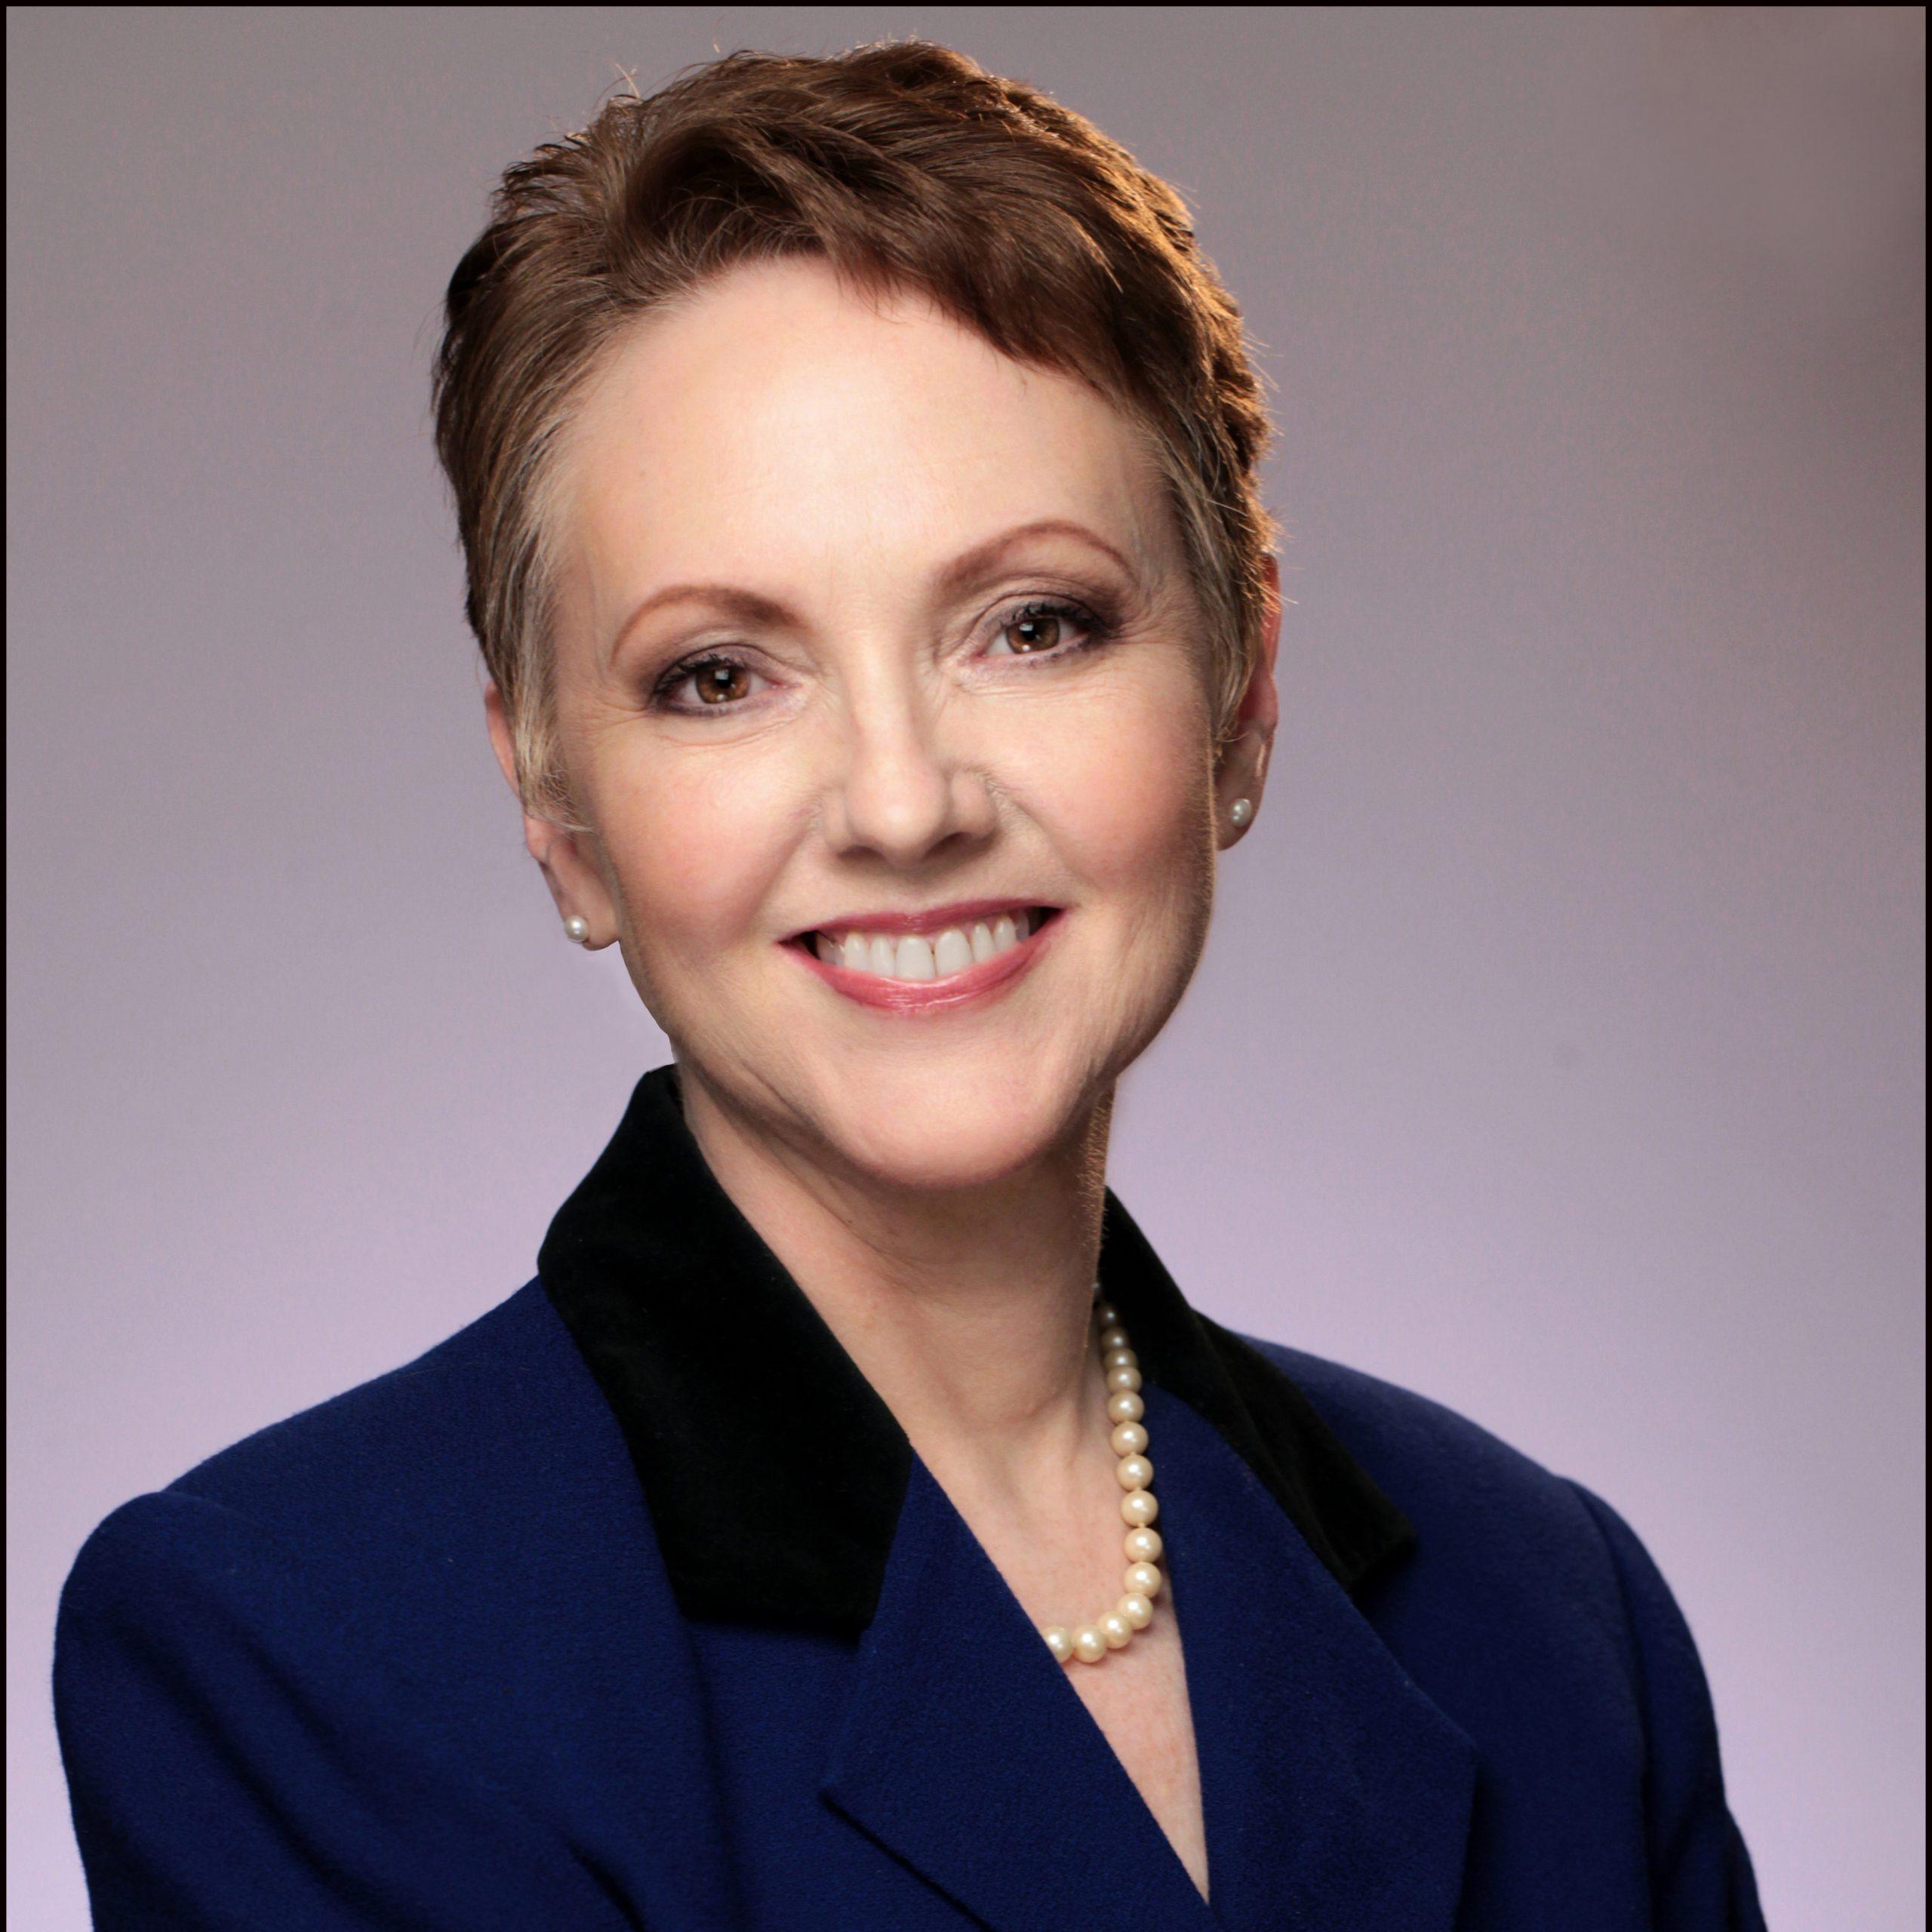 Suzanne Ishee